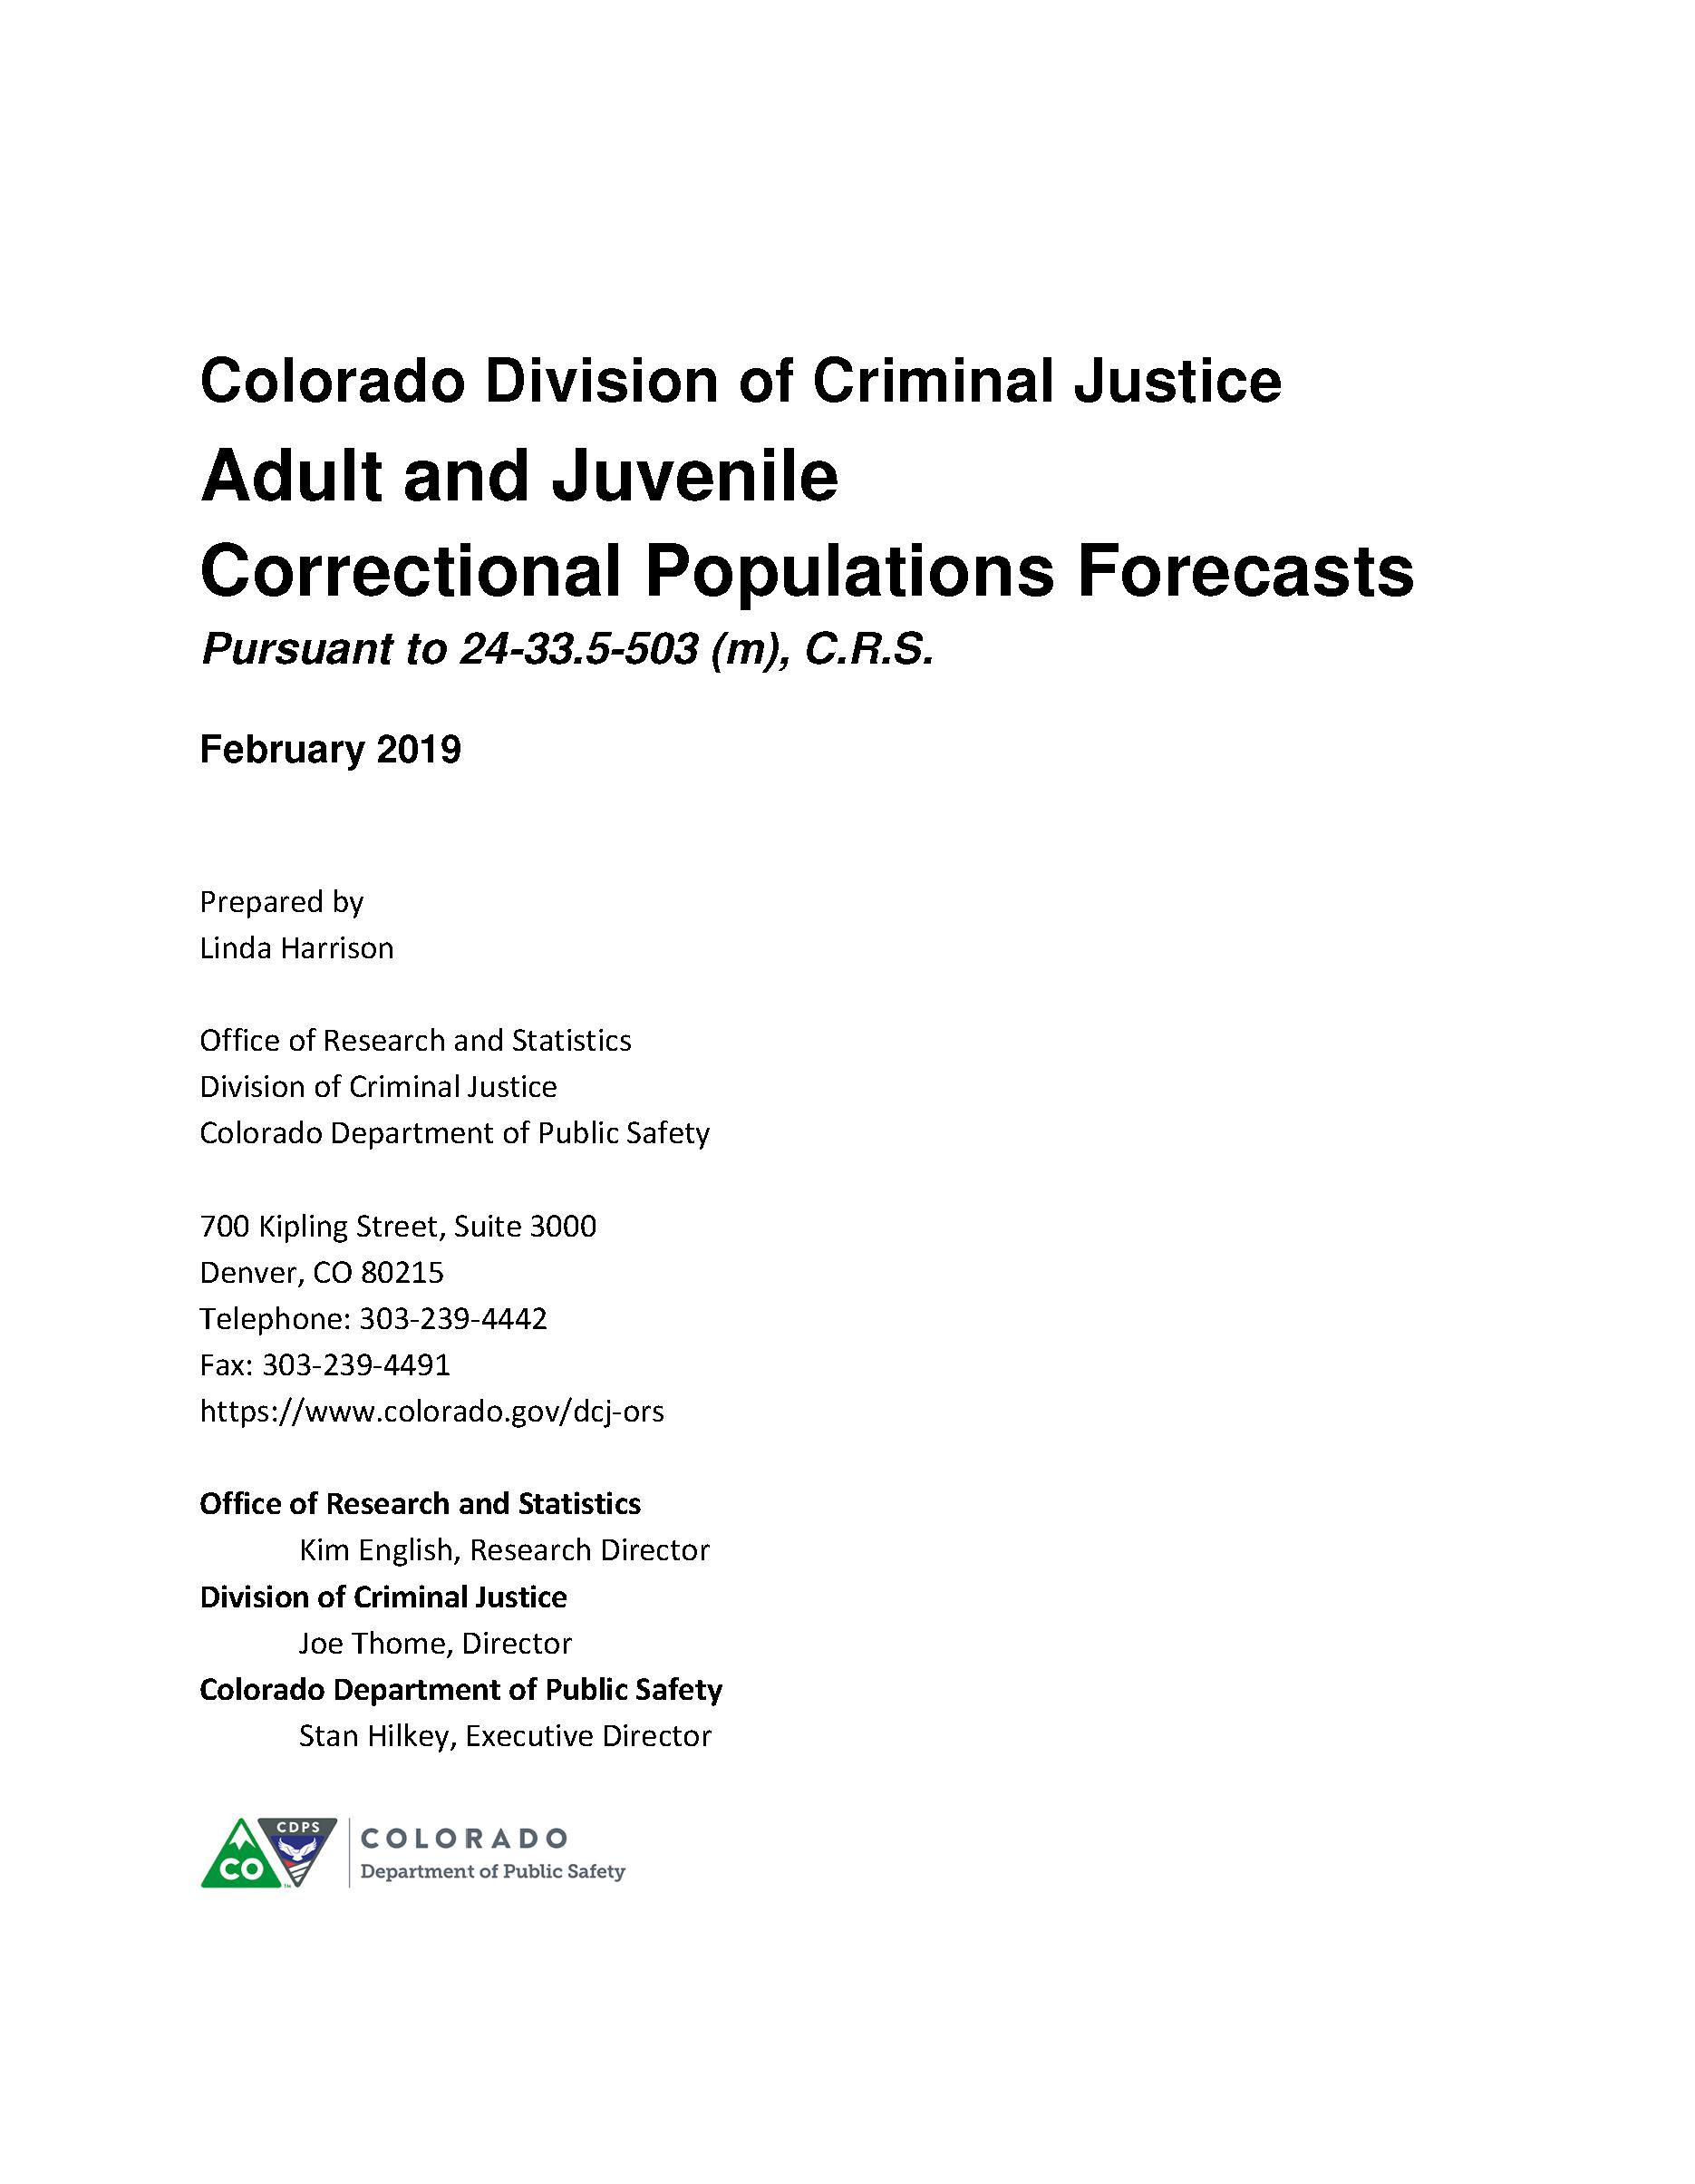 Correctional Population Forecasts, FY 2019 (February 2019)